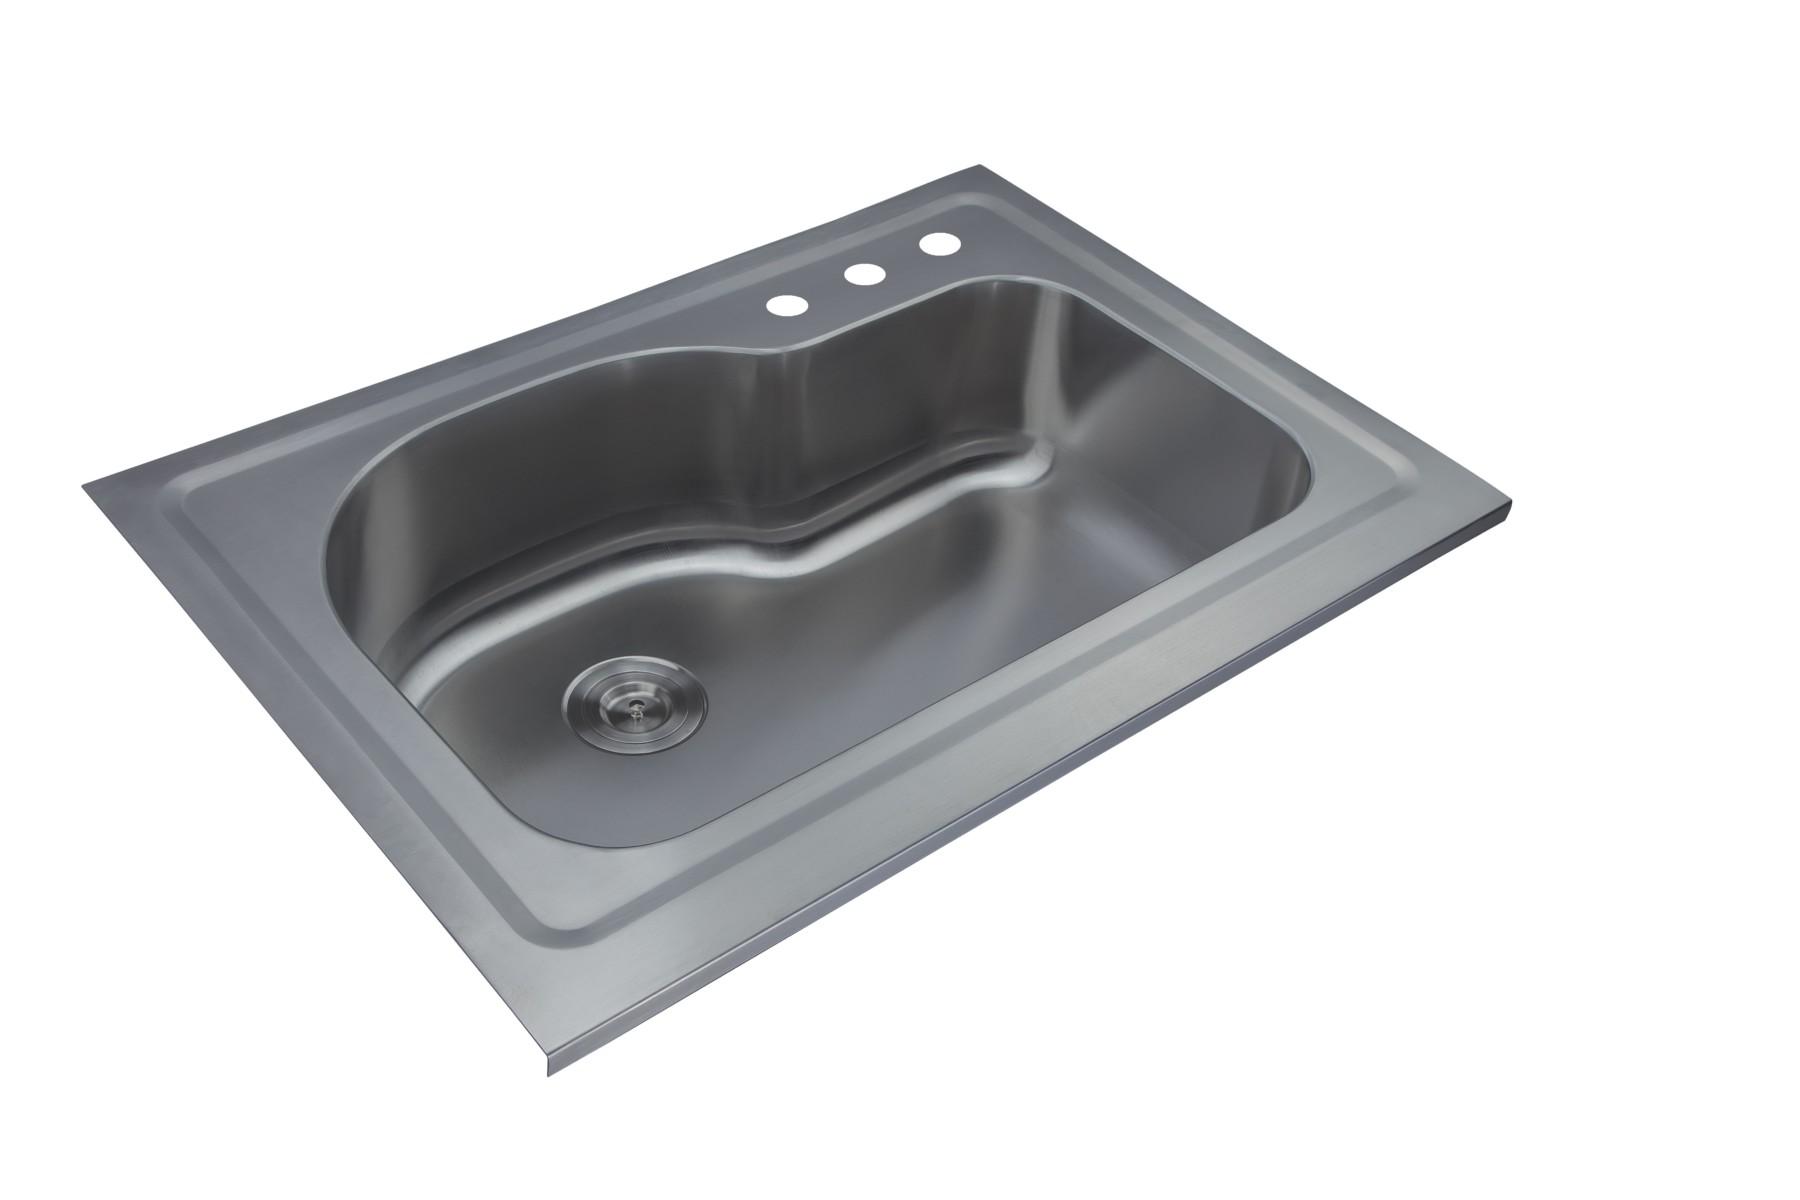 AS143 35.6u2033 X 25.5u2033 X 9.25u2033 18G Single Bowl Slide In Topmount Economy  Stainless Steel Kitchen Sink